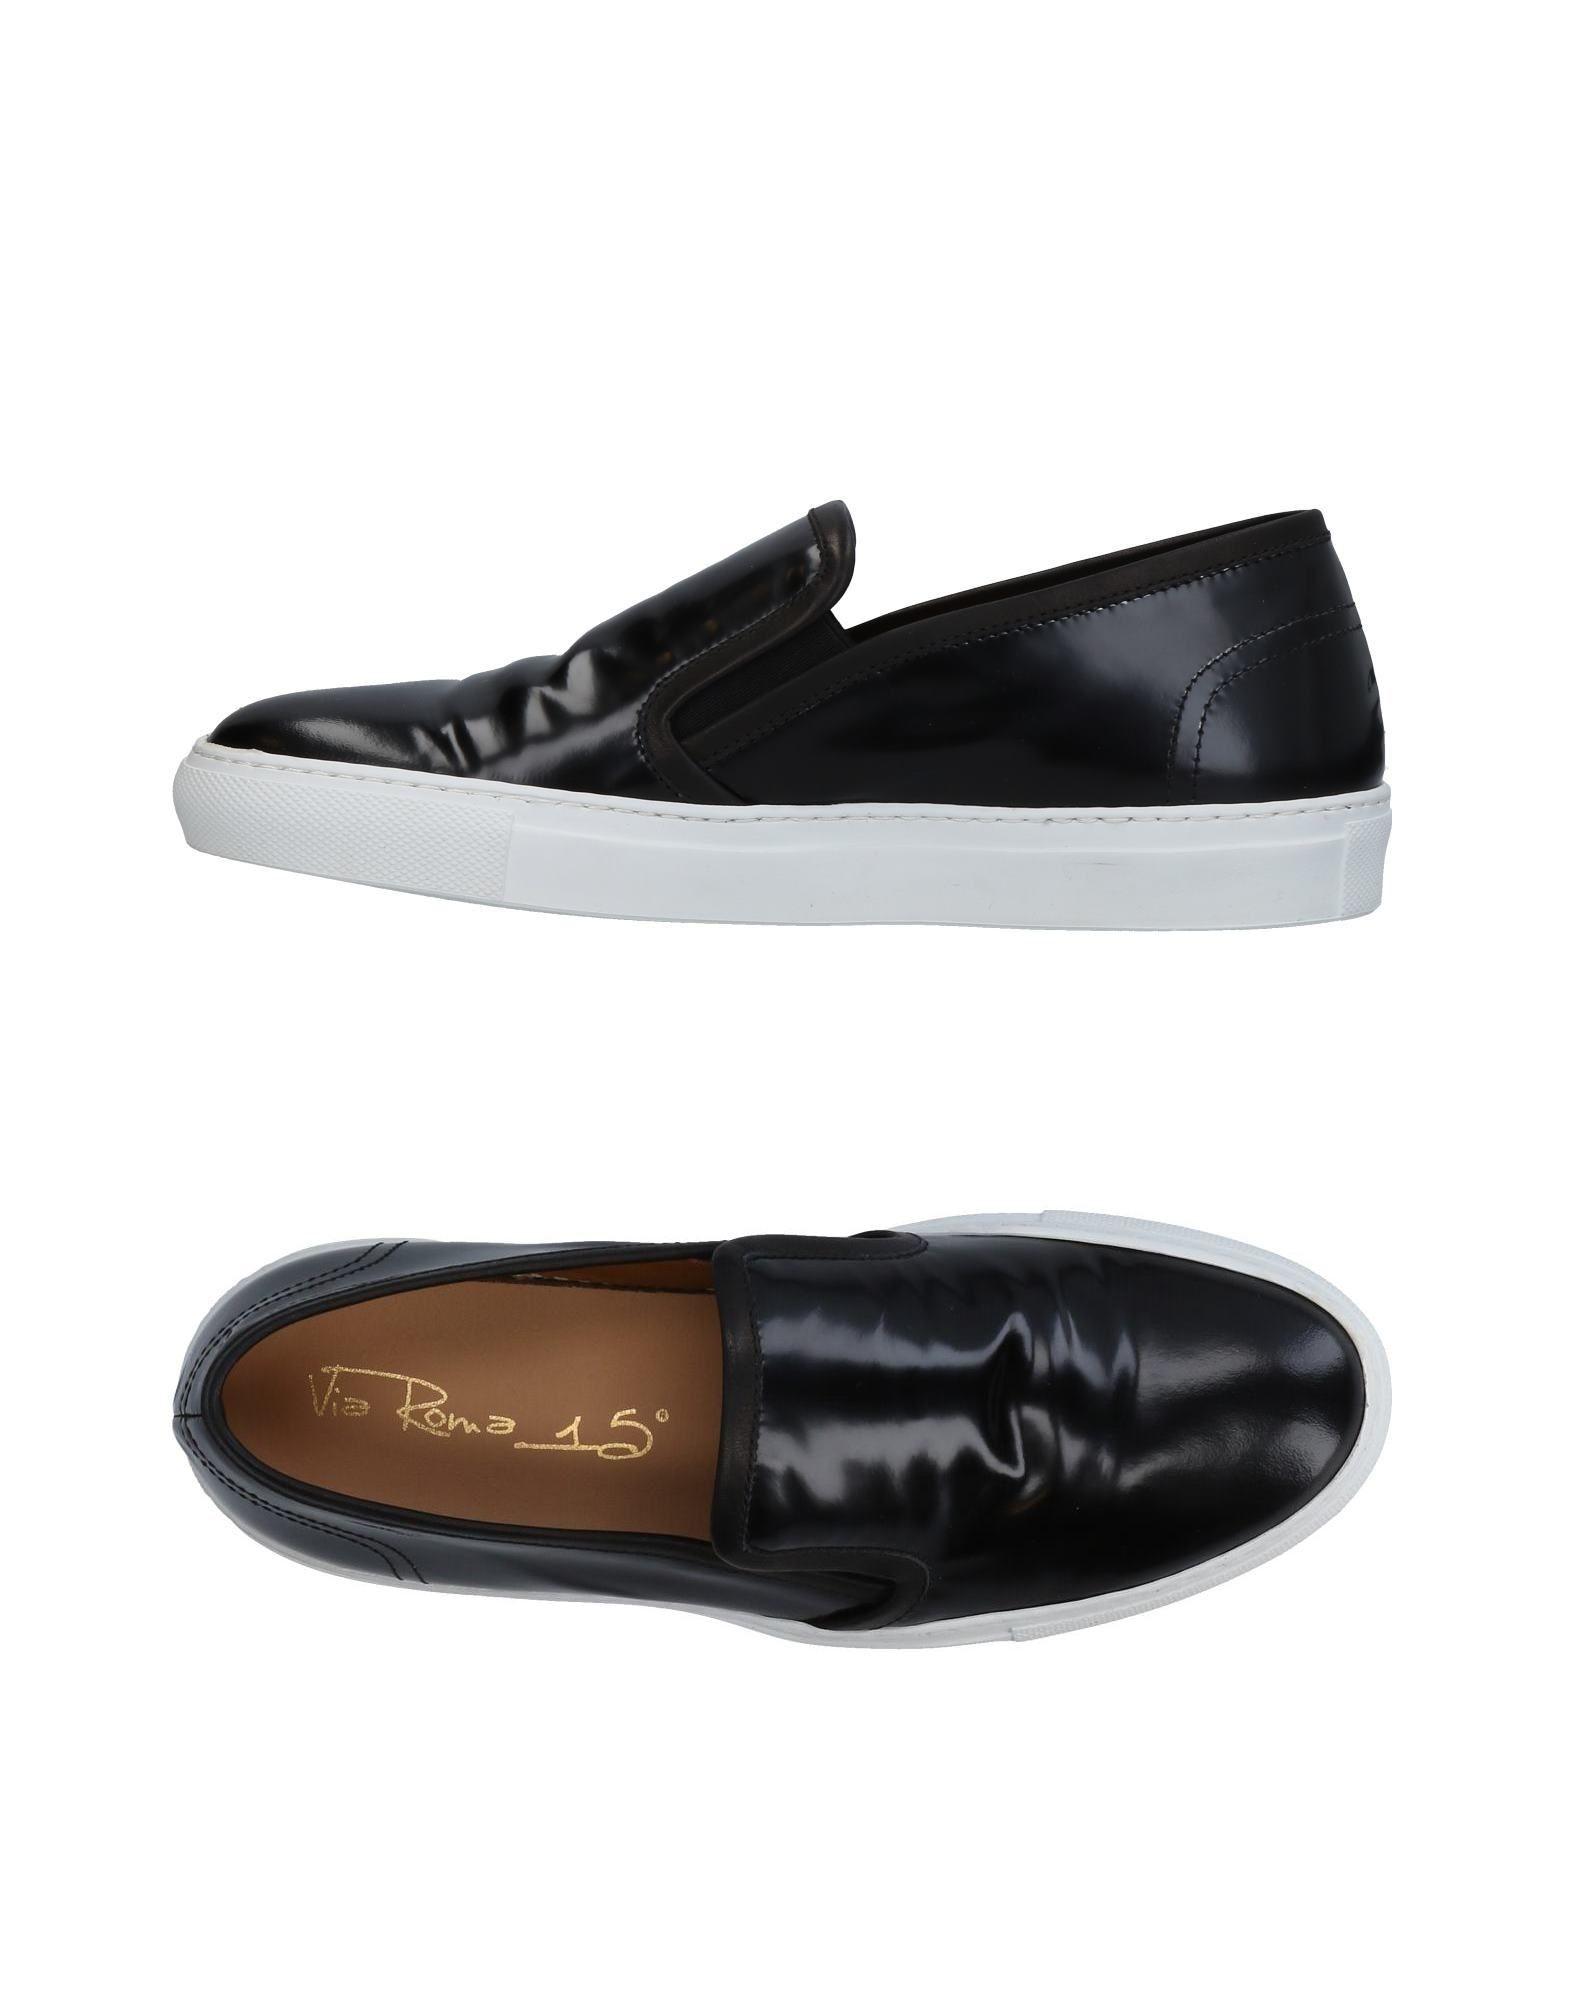 Via Roma 15 Sneakers Damen  11456065MA Gute Qualität beliebte Schuhe